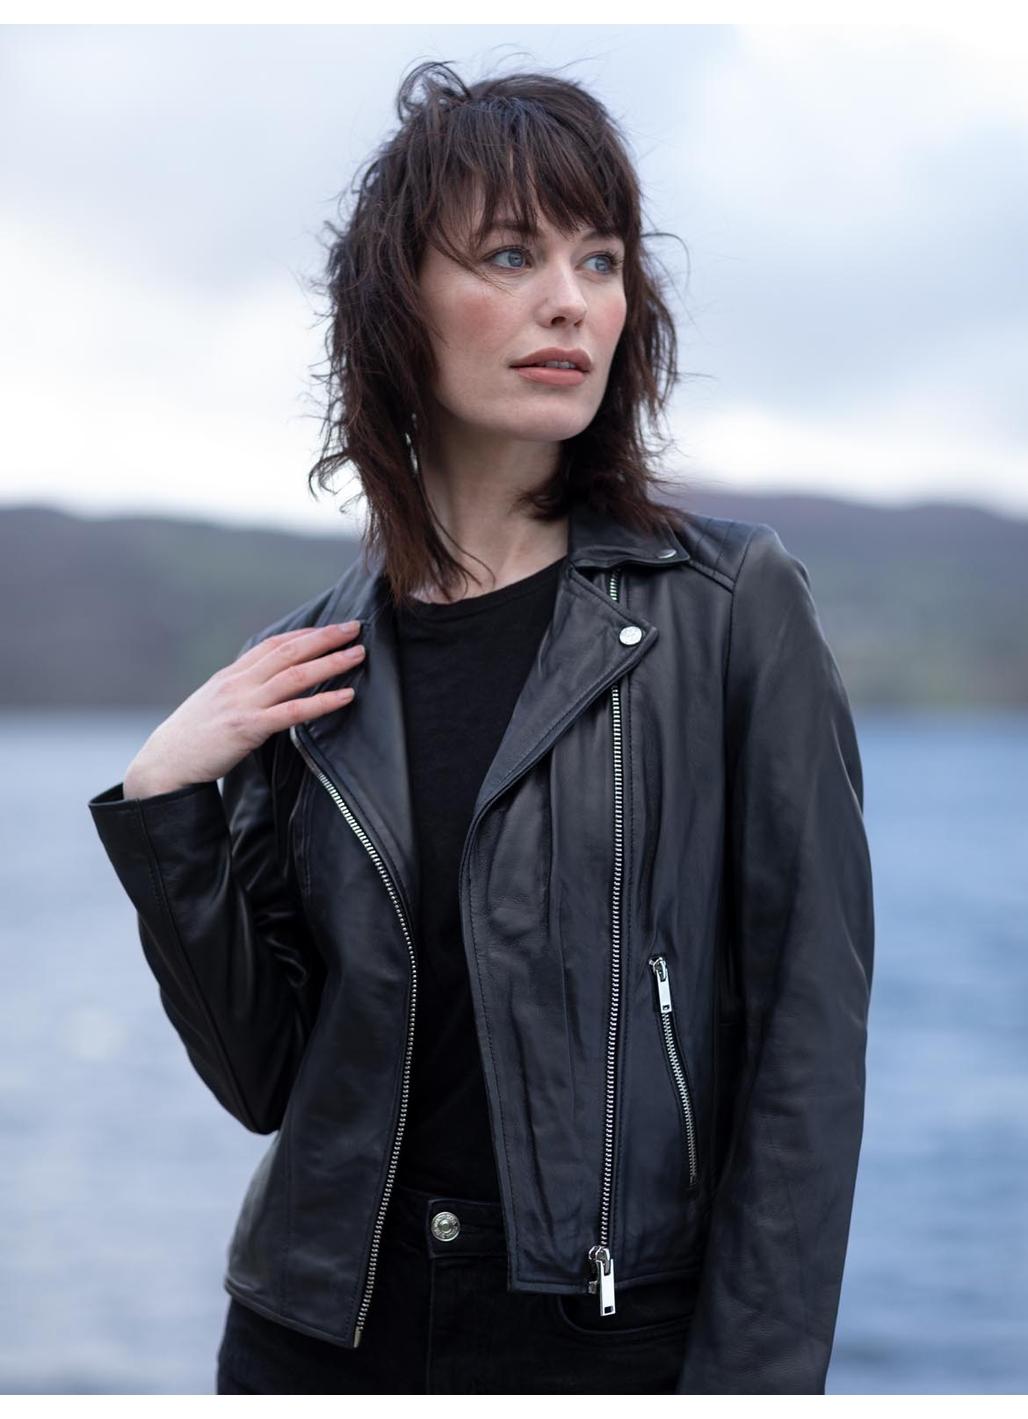 Thirlmere Leather Biker Jacket in Black